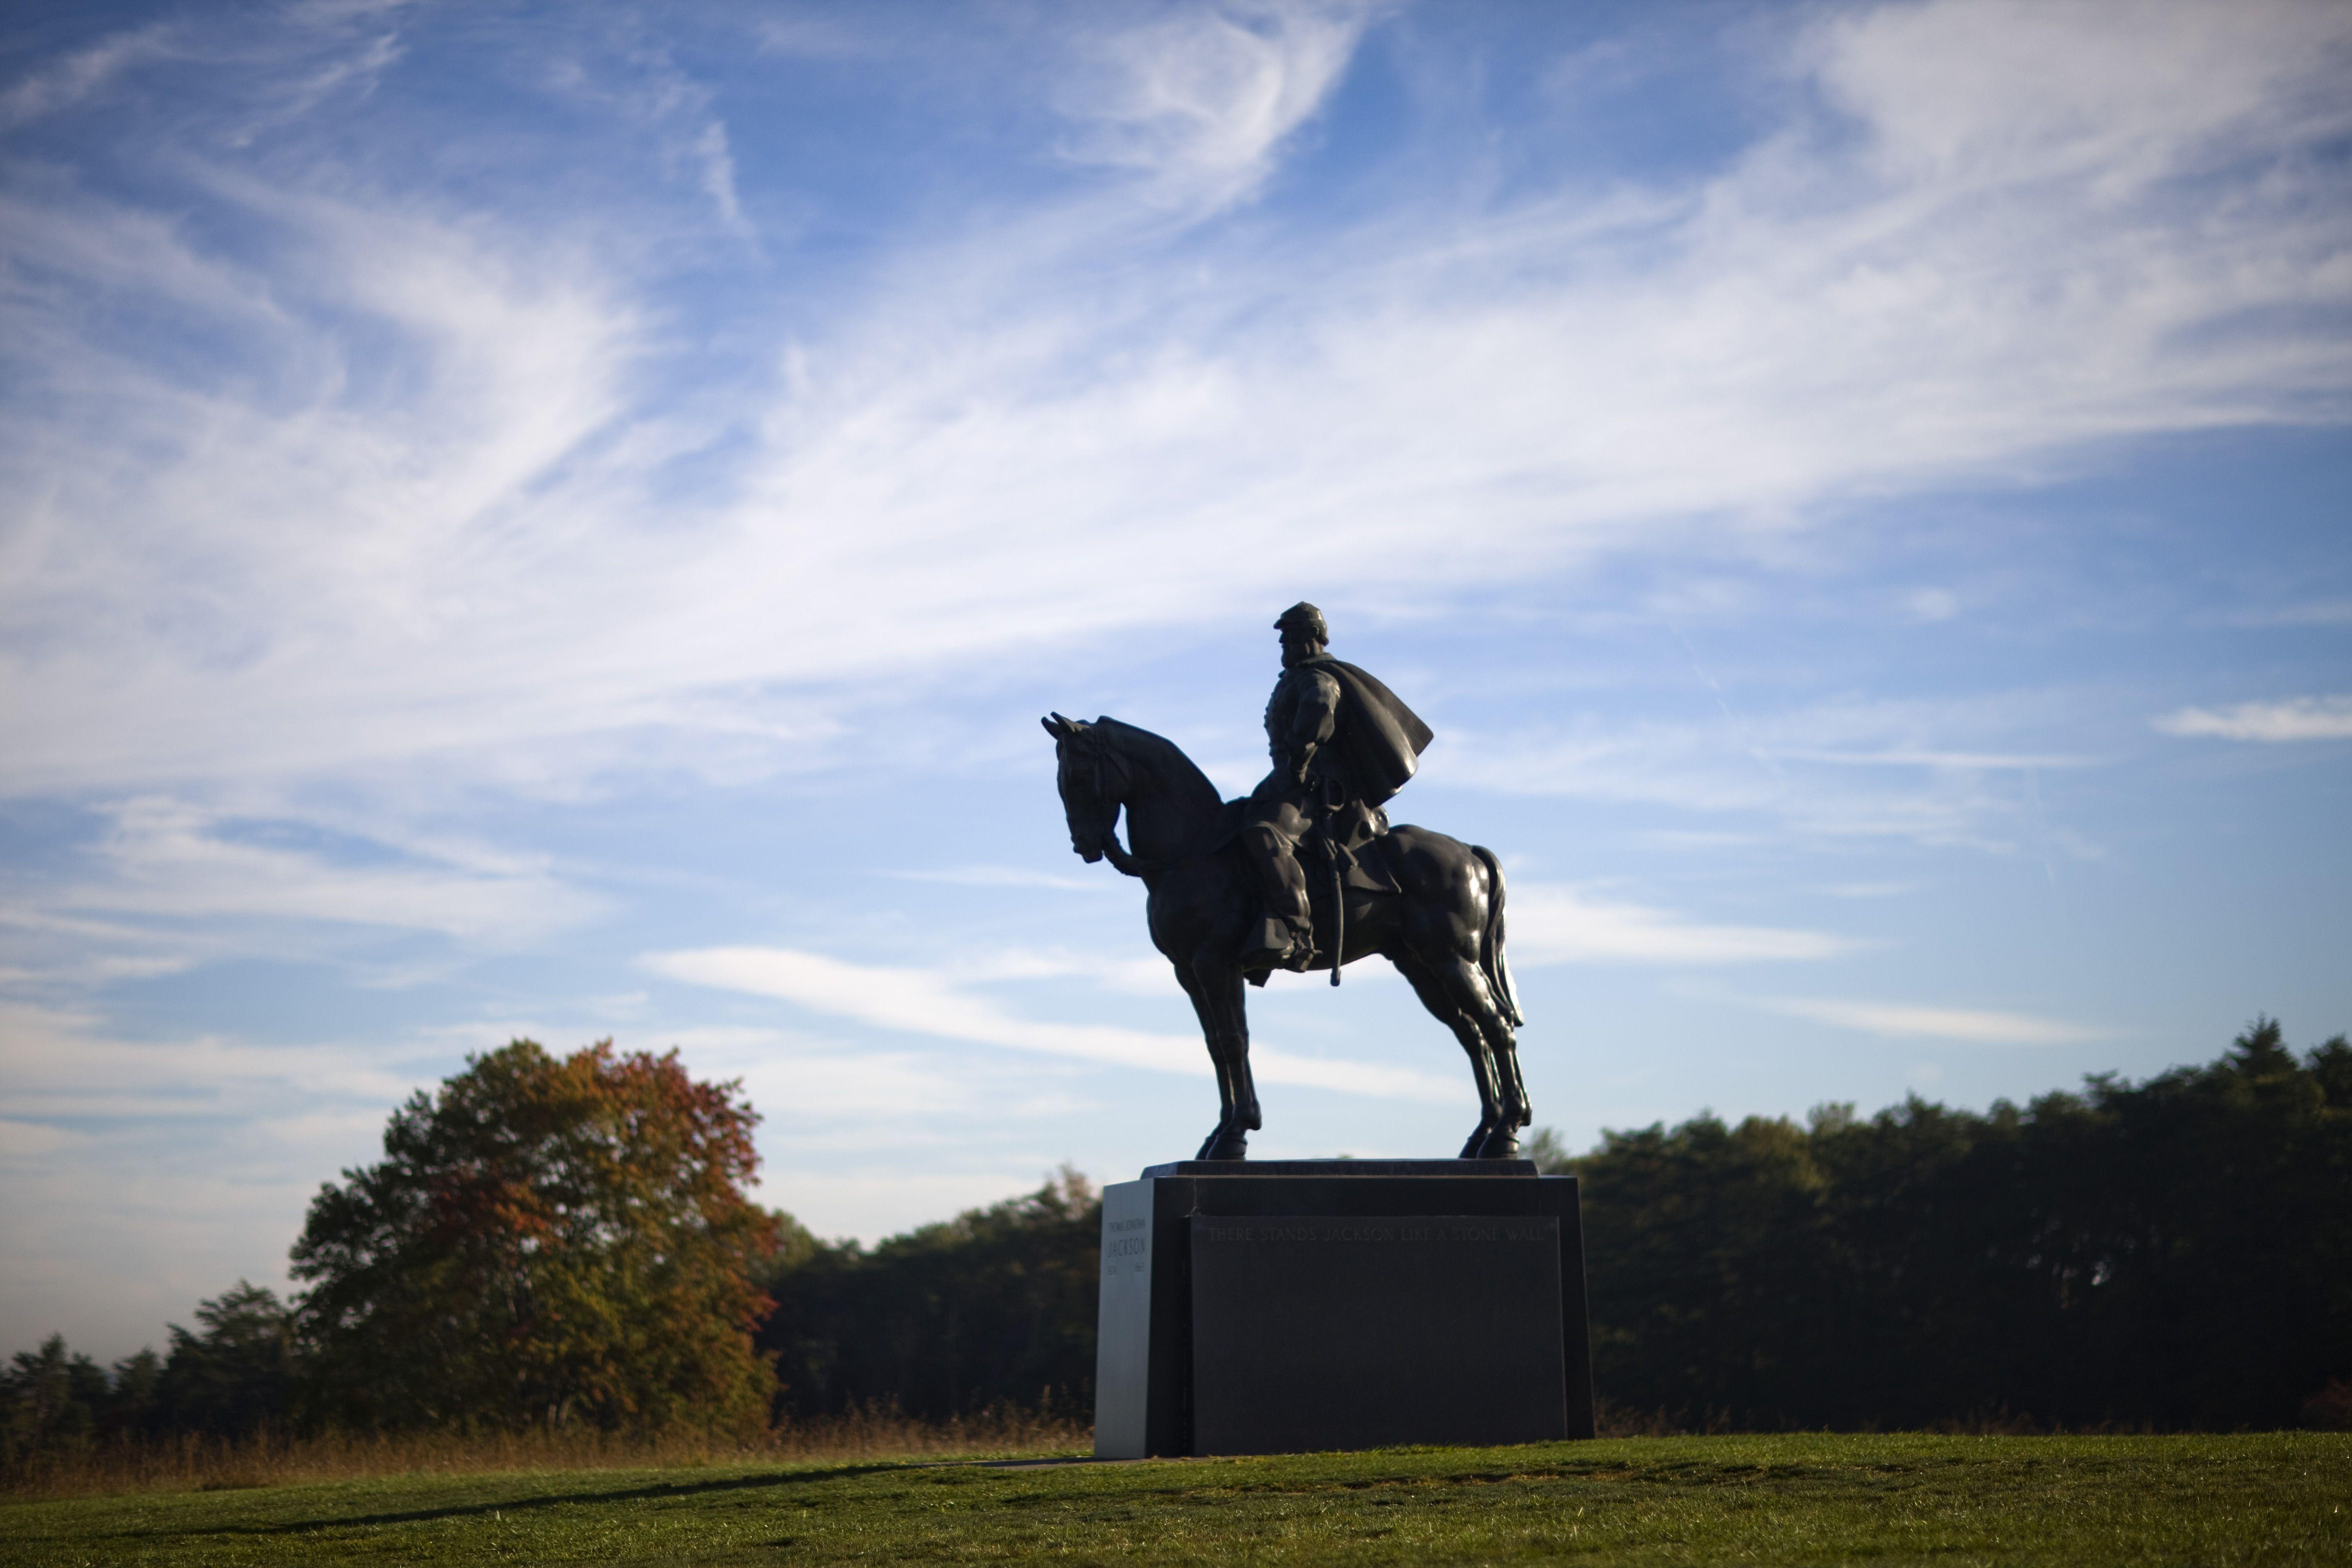 confederate general thomas jackson bull run battlefield battle of